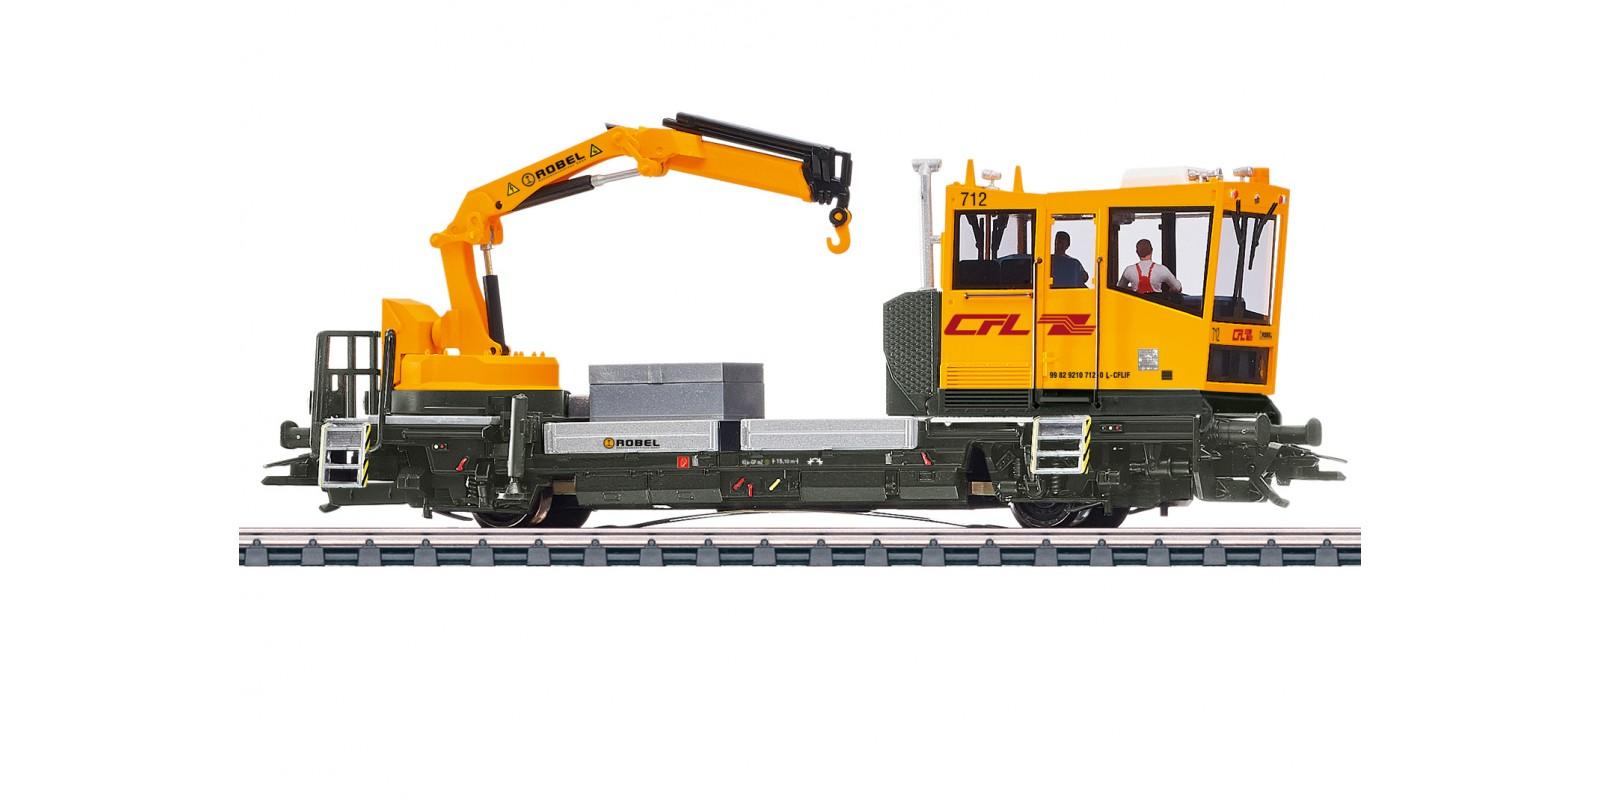 39544 ROBEL Powered Track Car